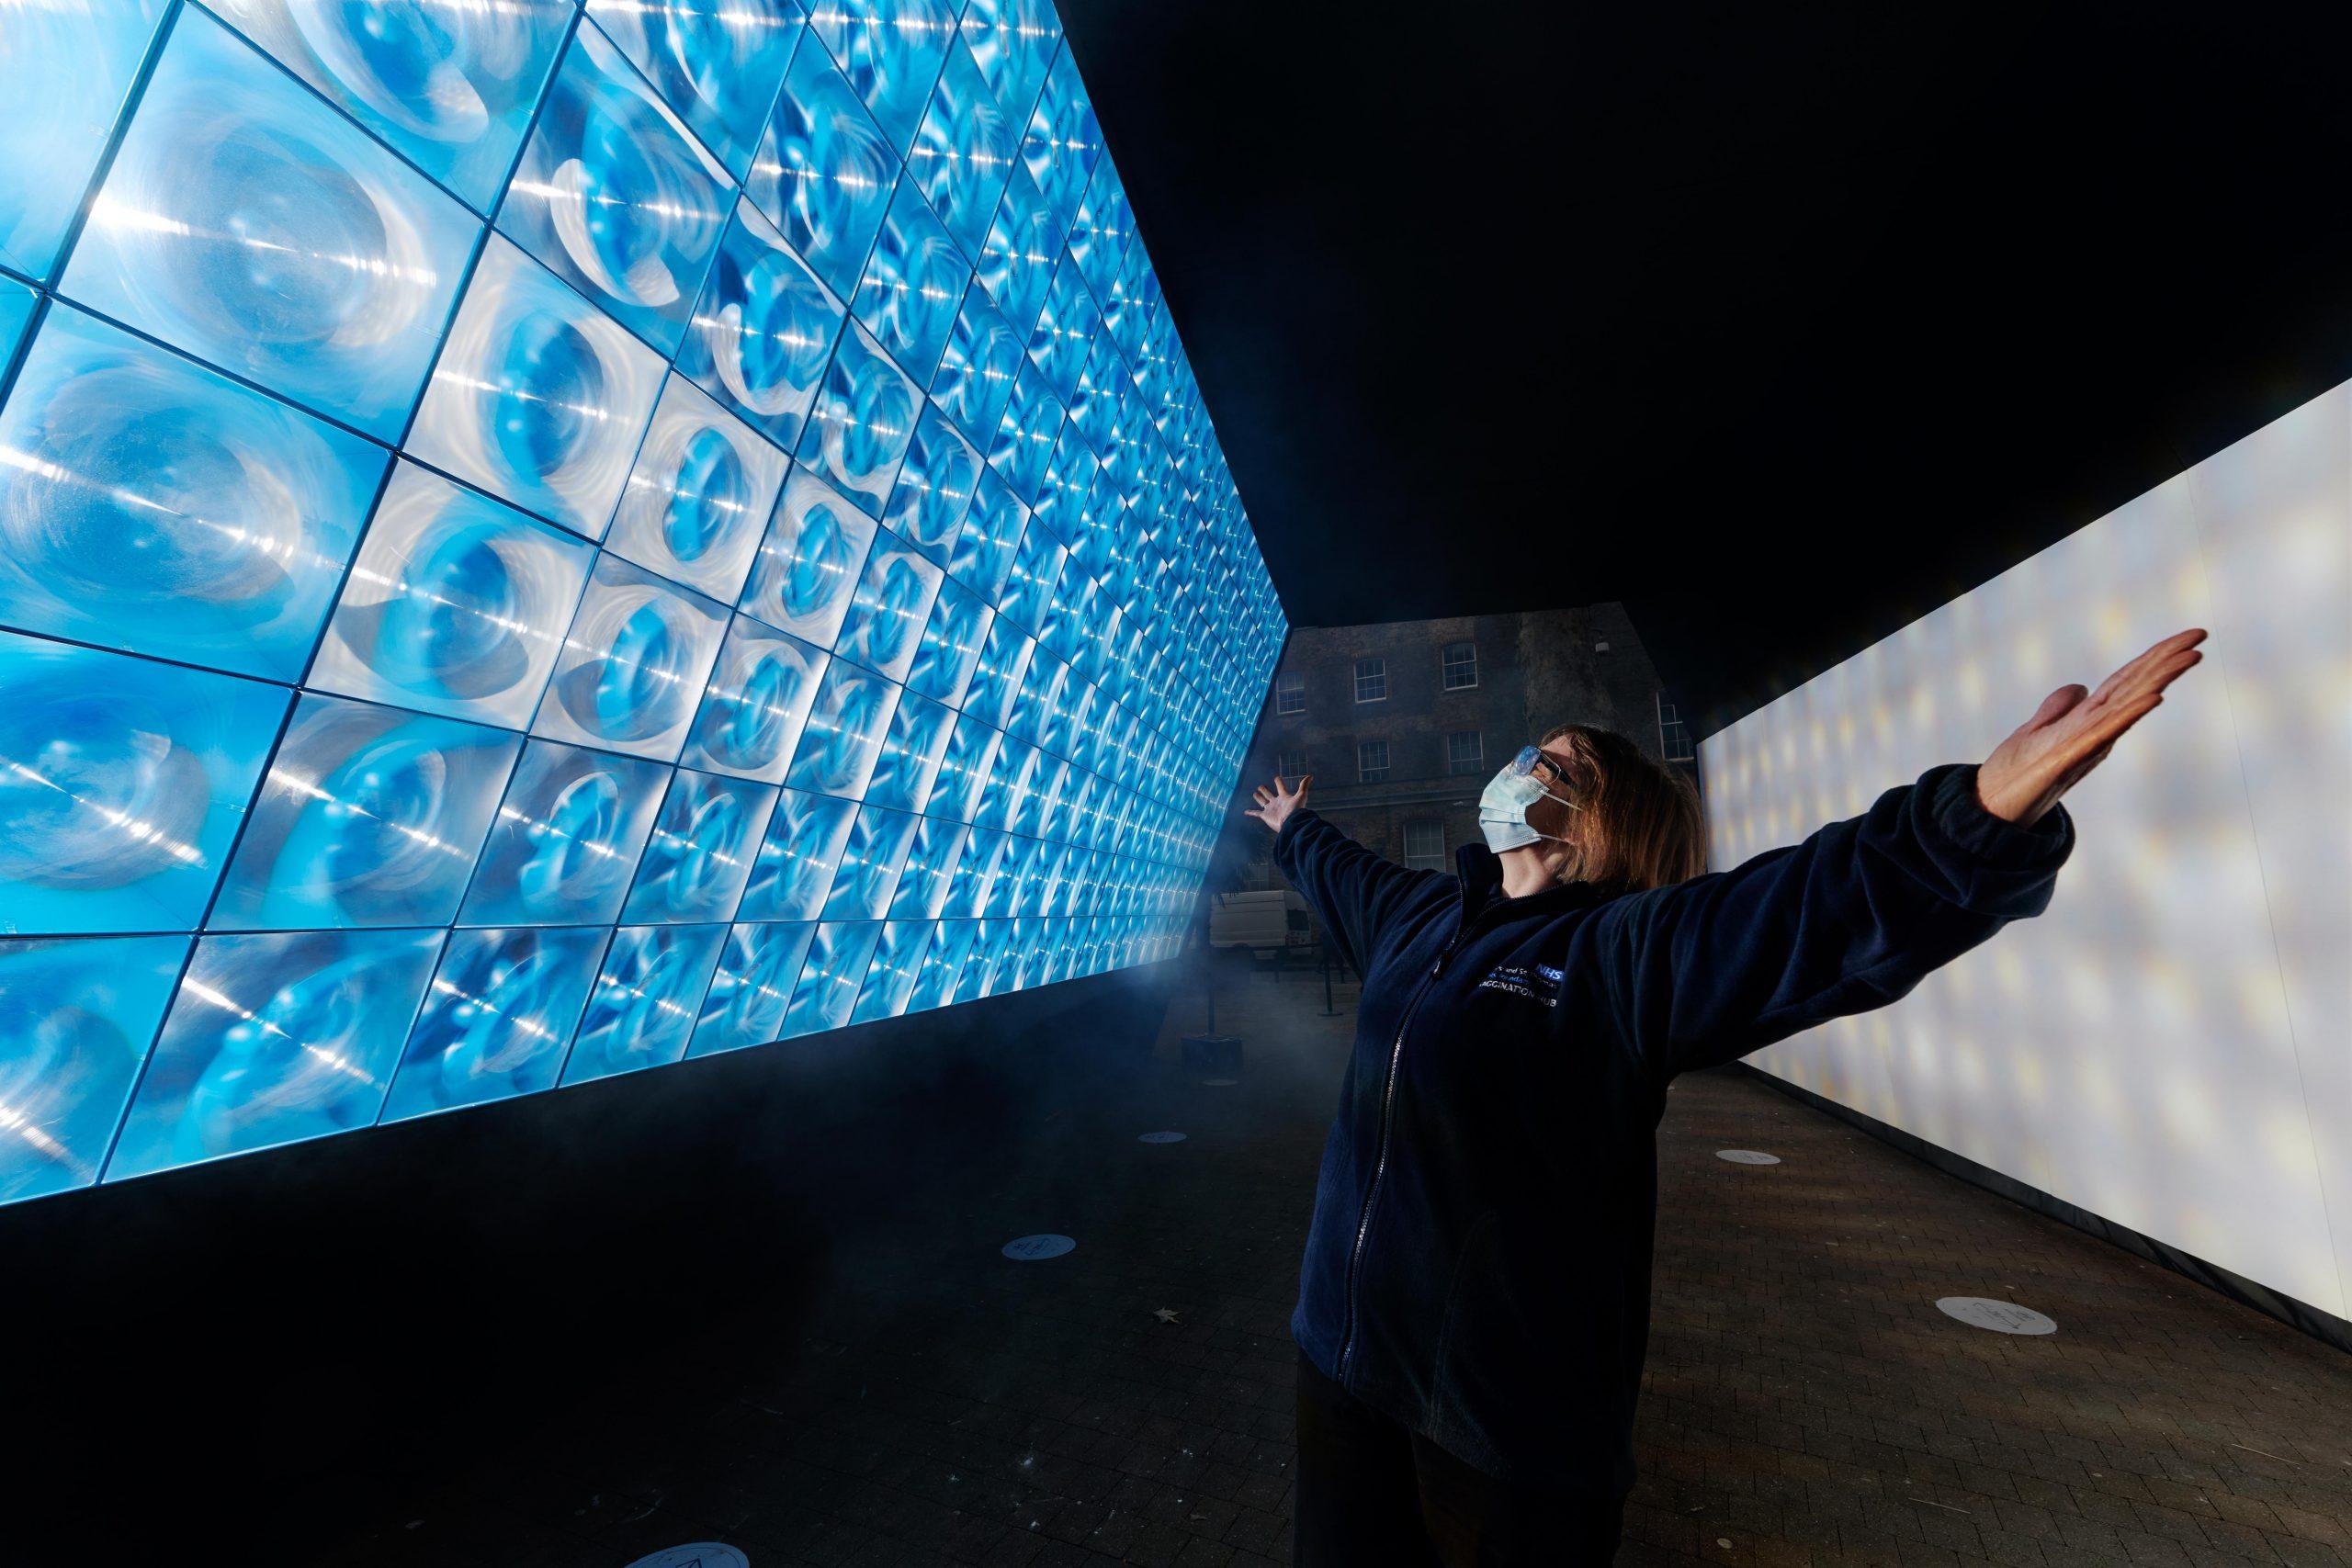 SOLA (Tunnel of Light)